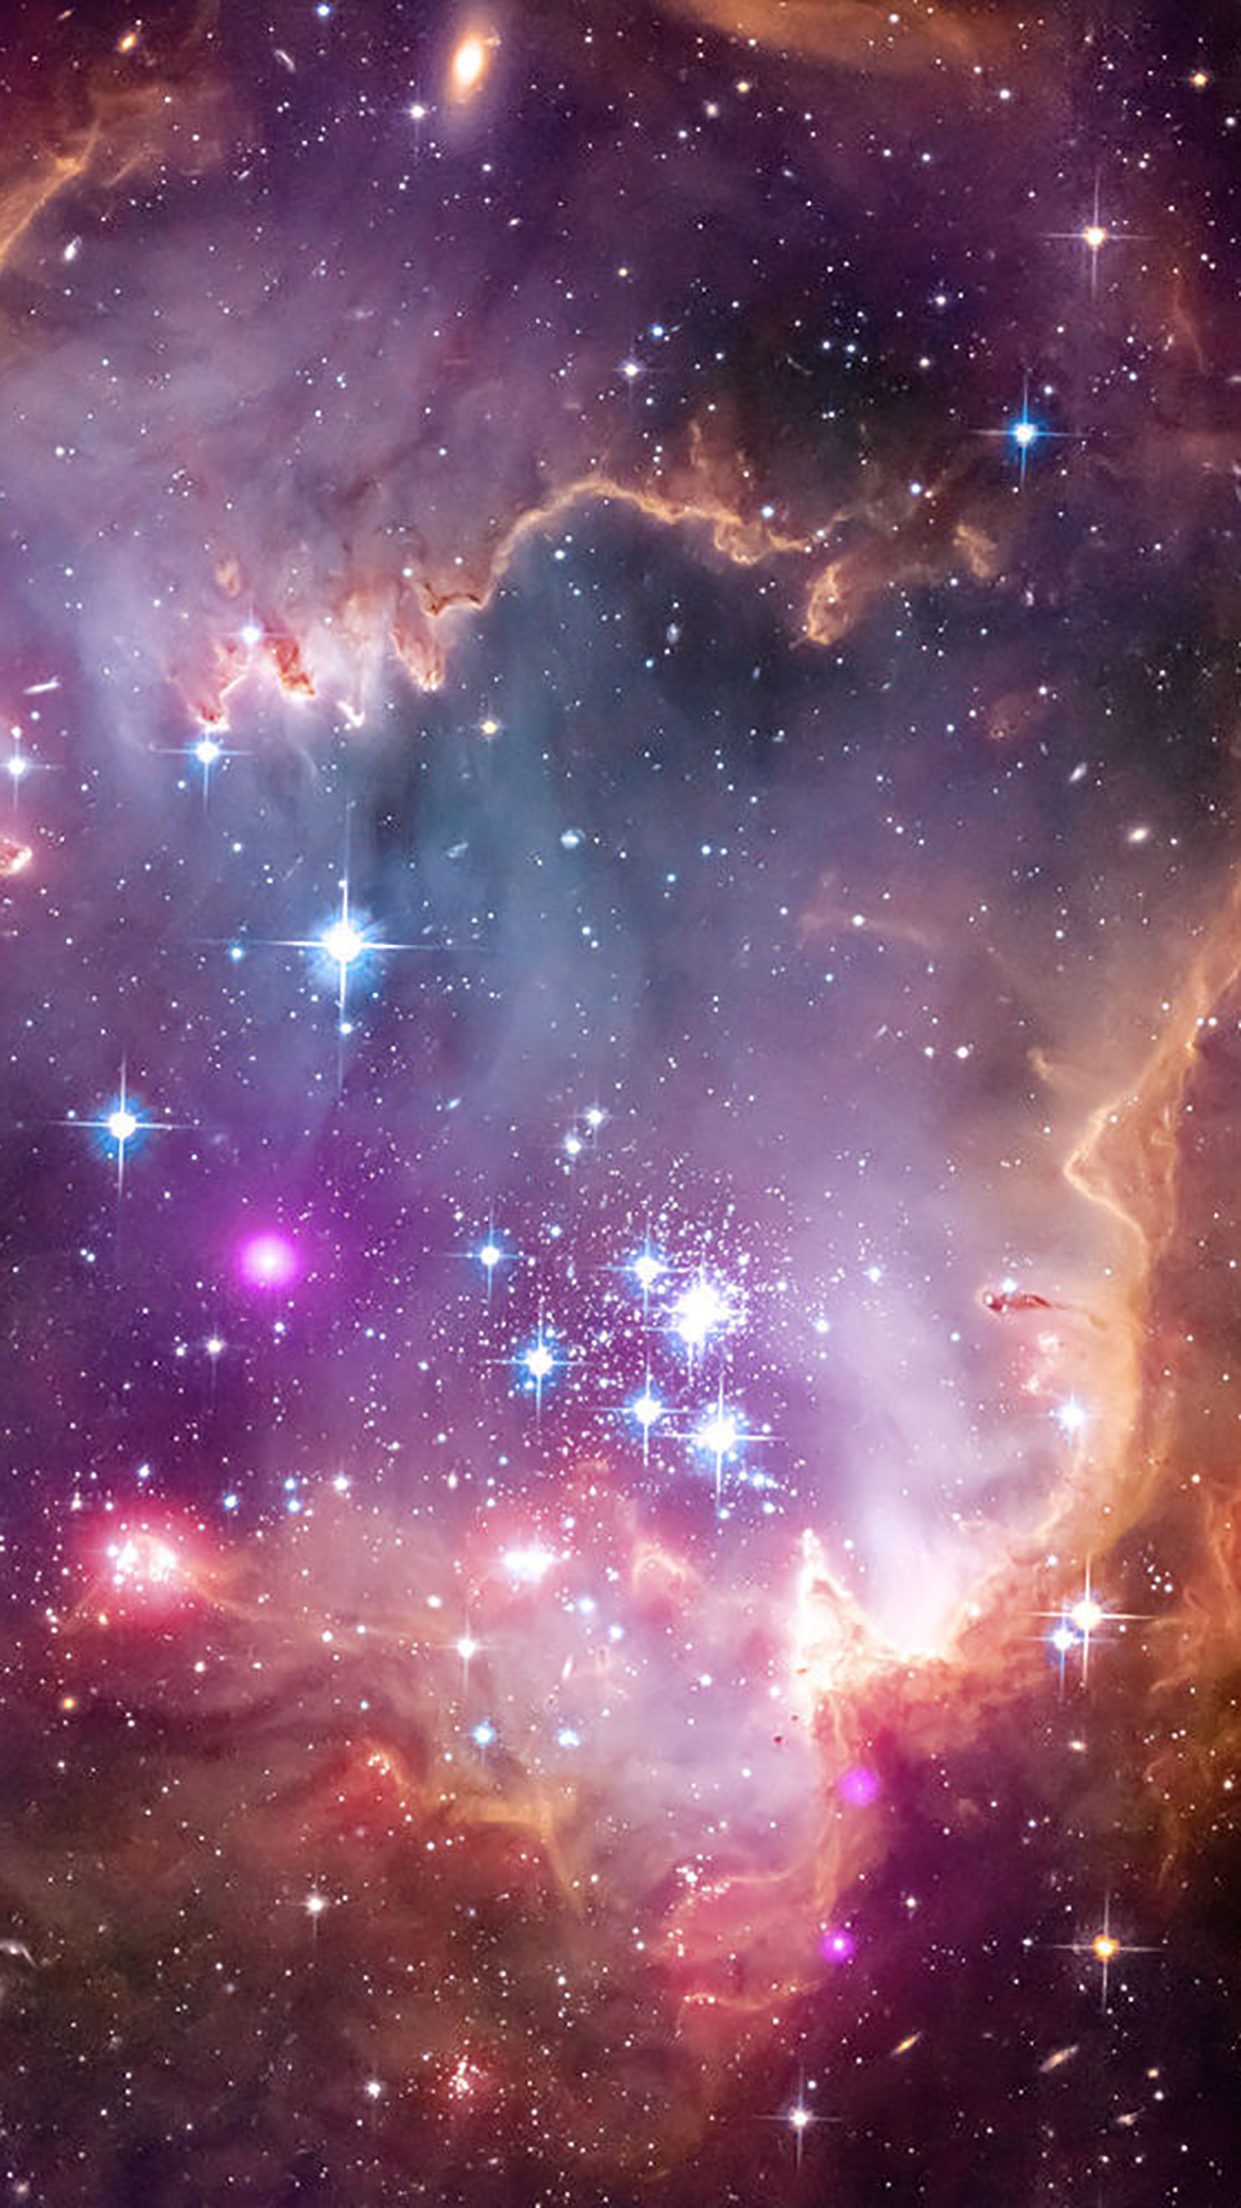 Galaxies 2 3Wallpapers iPhone Parallax Galaxies : 2